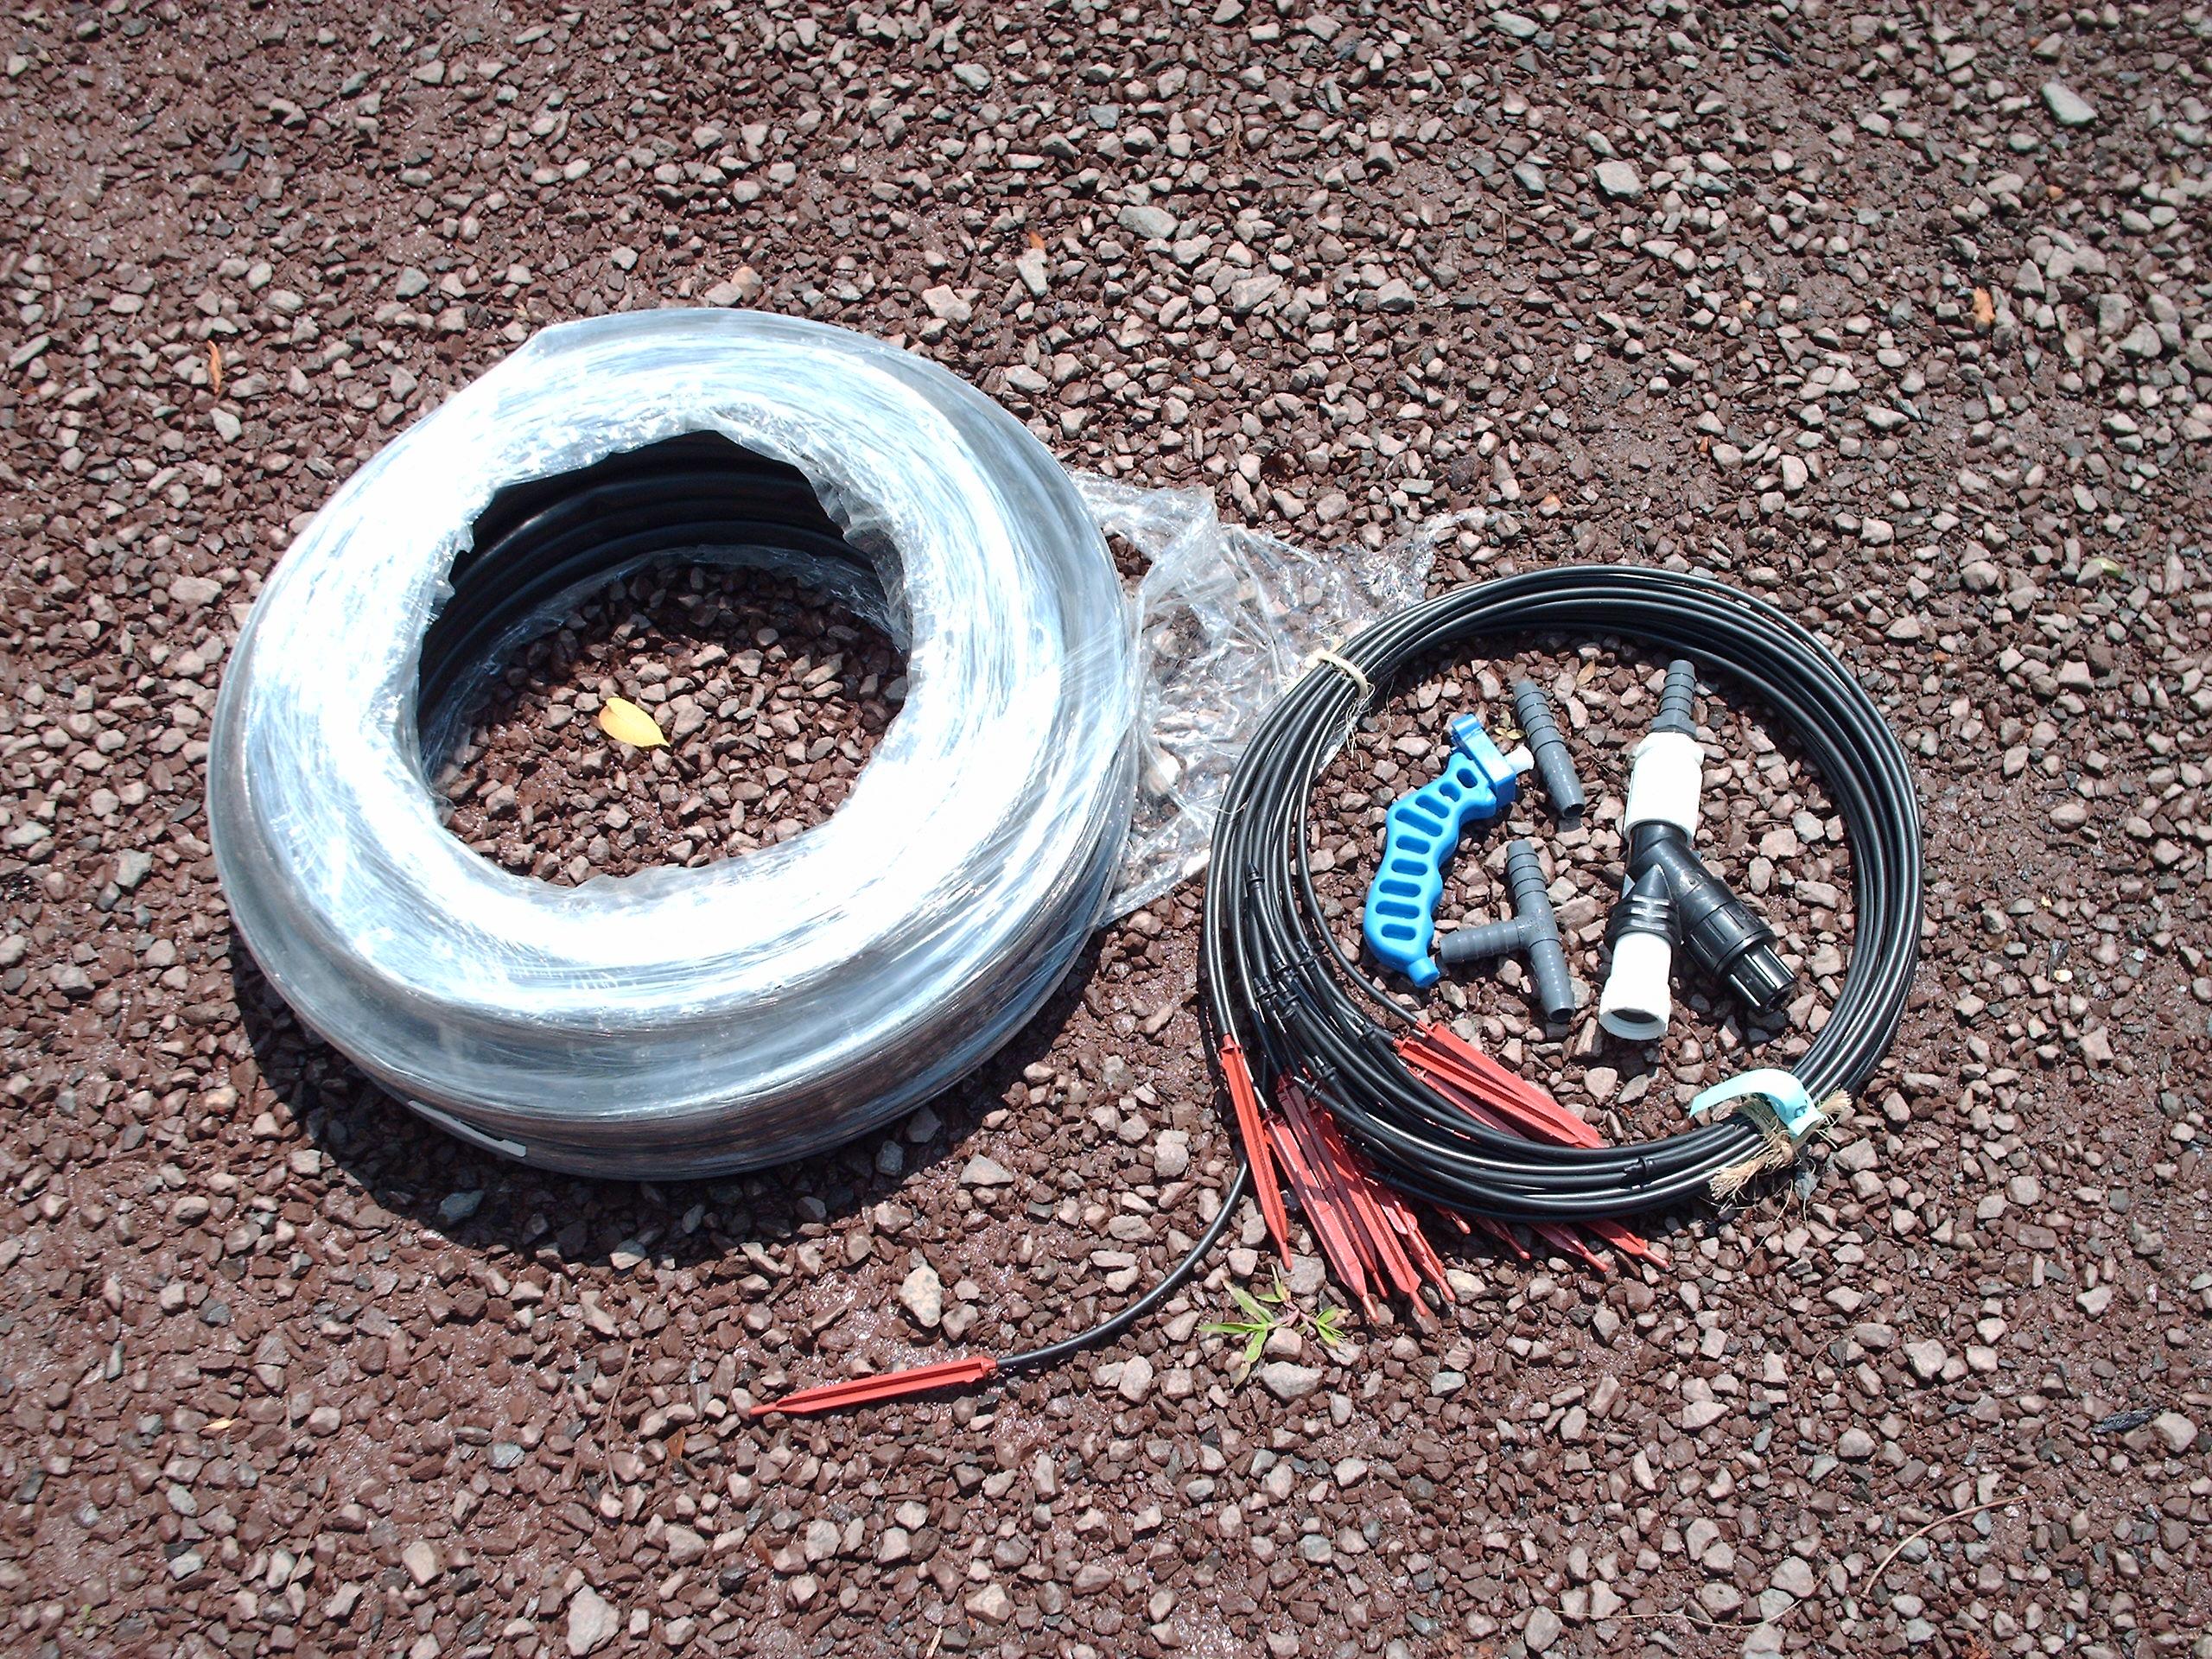 We supply drip irrigation kits